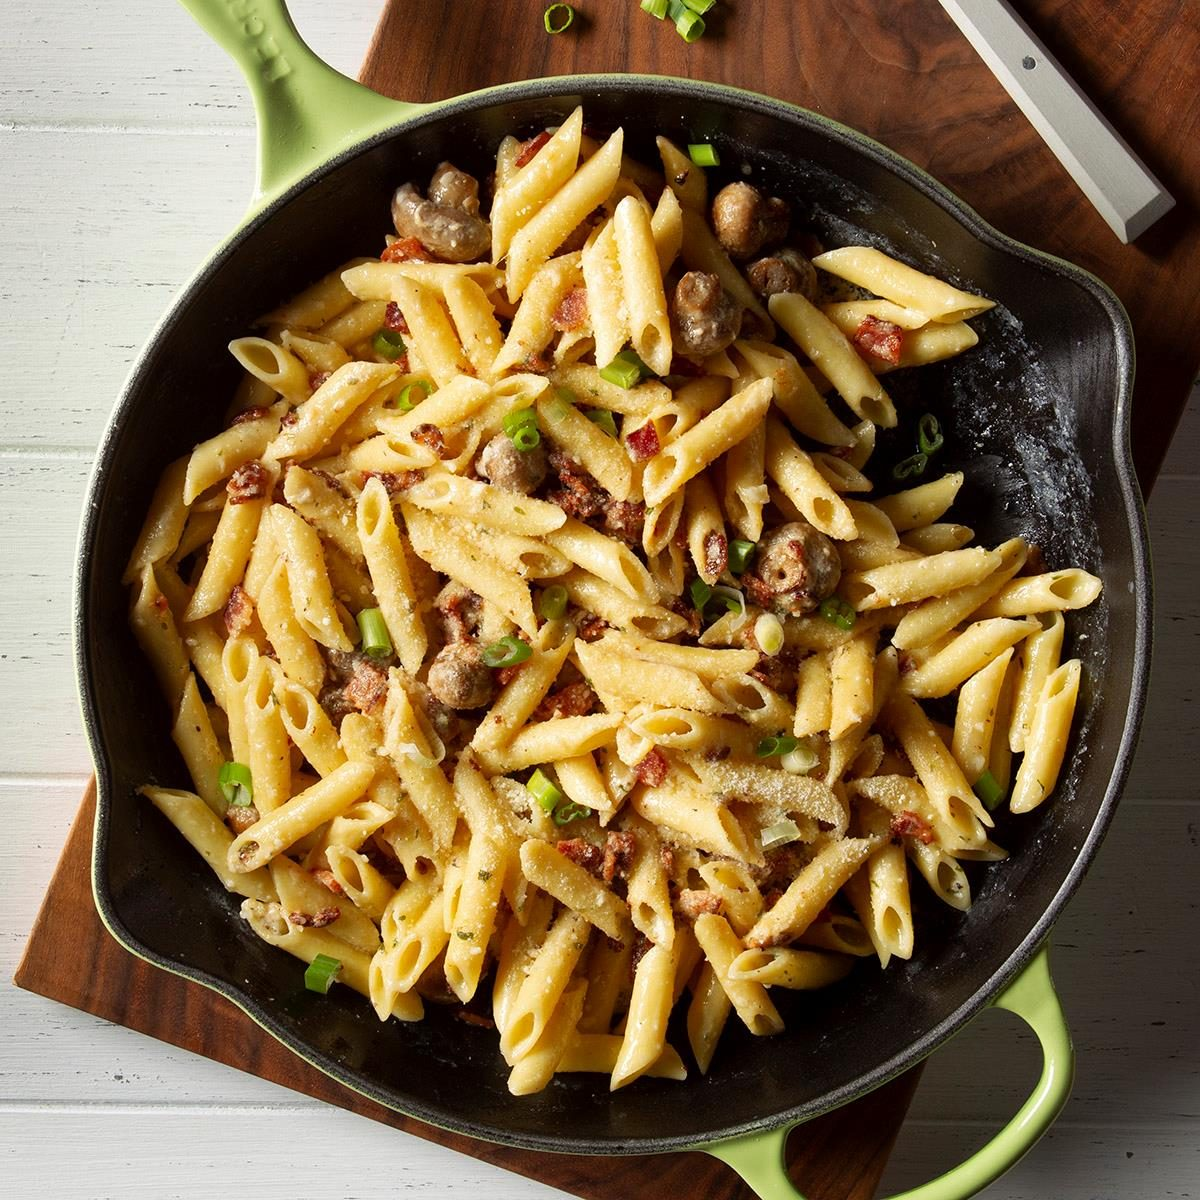 Day 22: Mushroom Pasta Carbonara